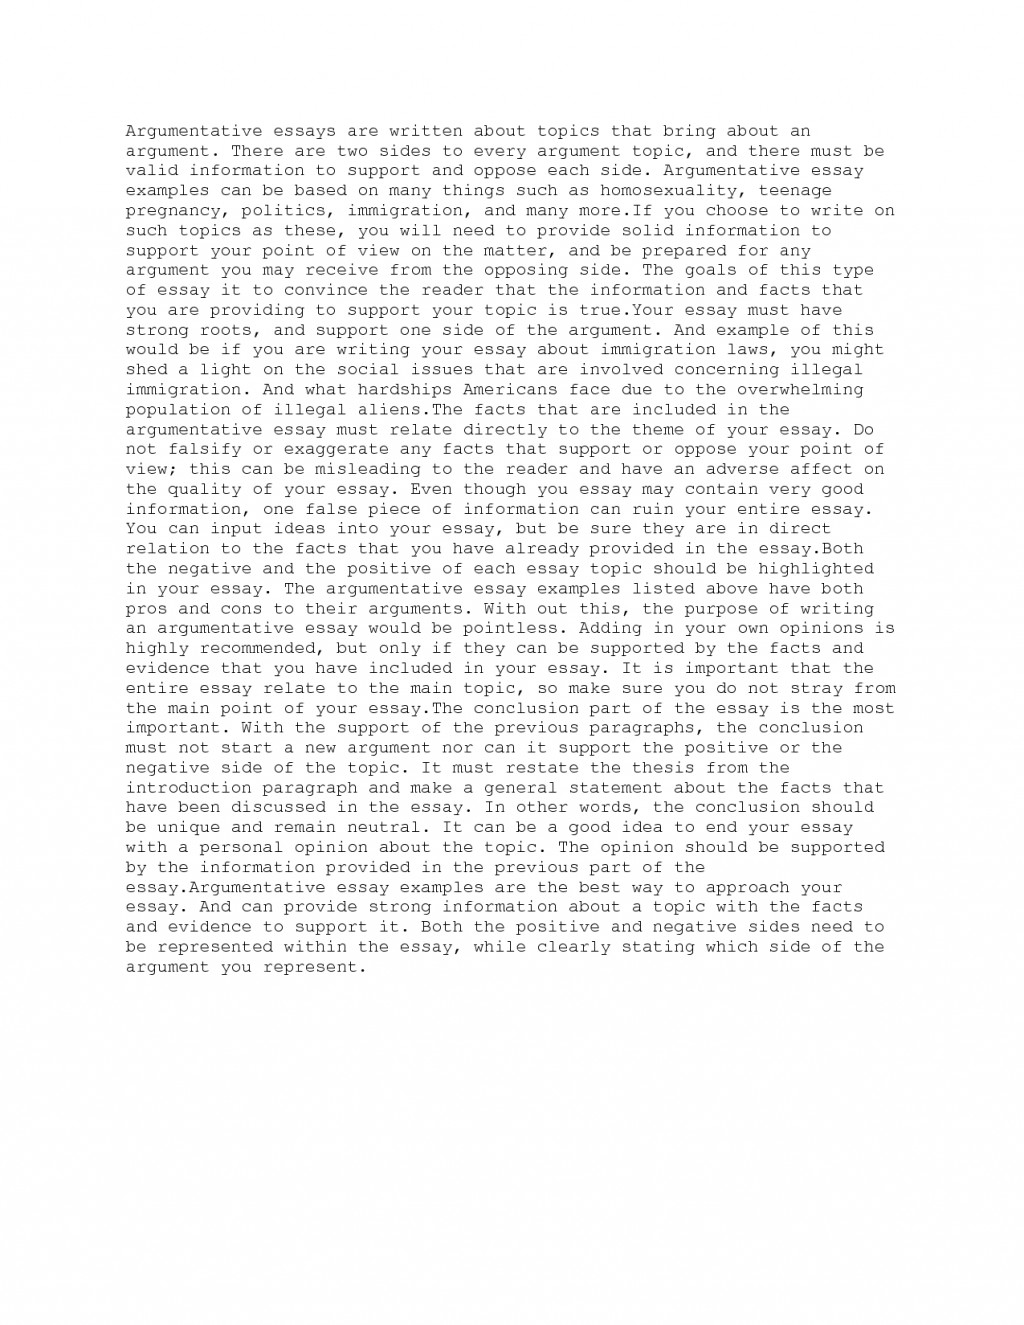 014 Qv3jjq5wkt Essay Example Good Topics For Wonderful A Discursive National 5 Interesting Persuasive Large